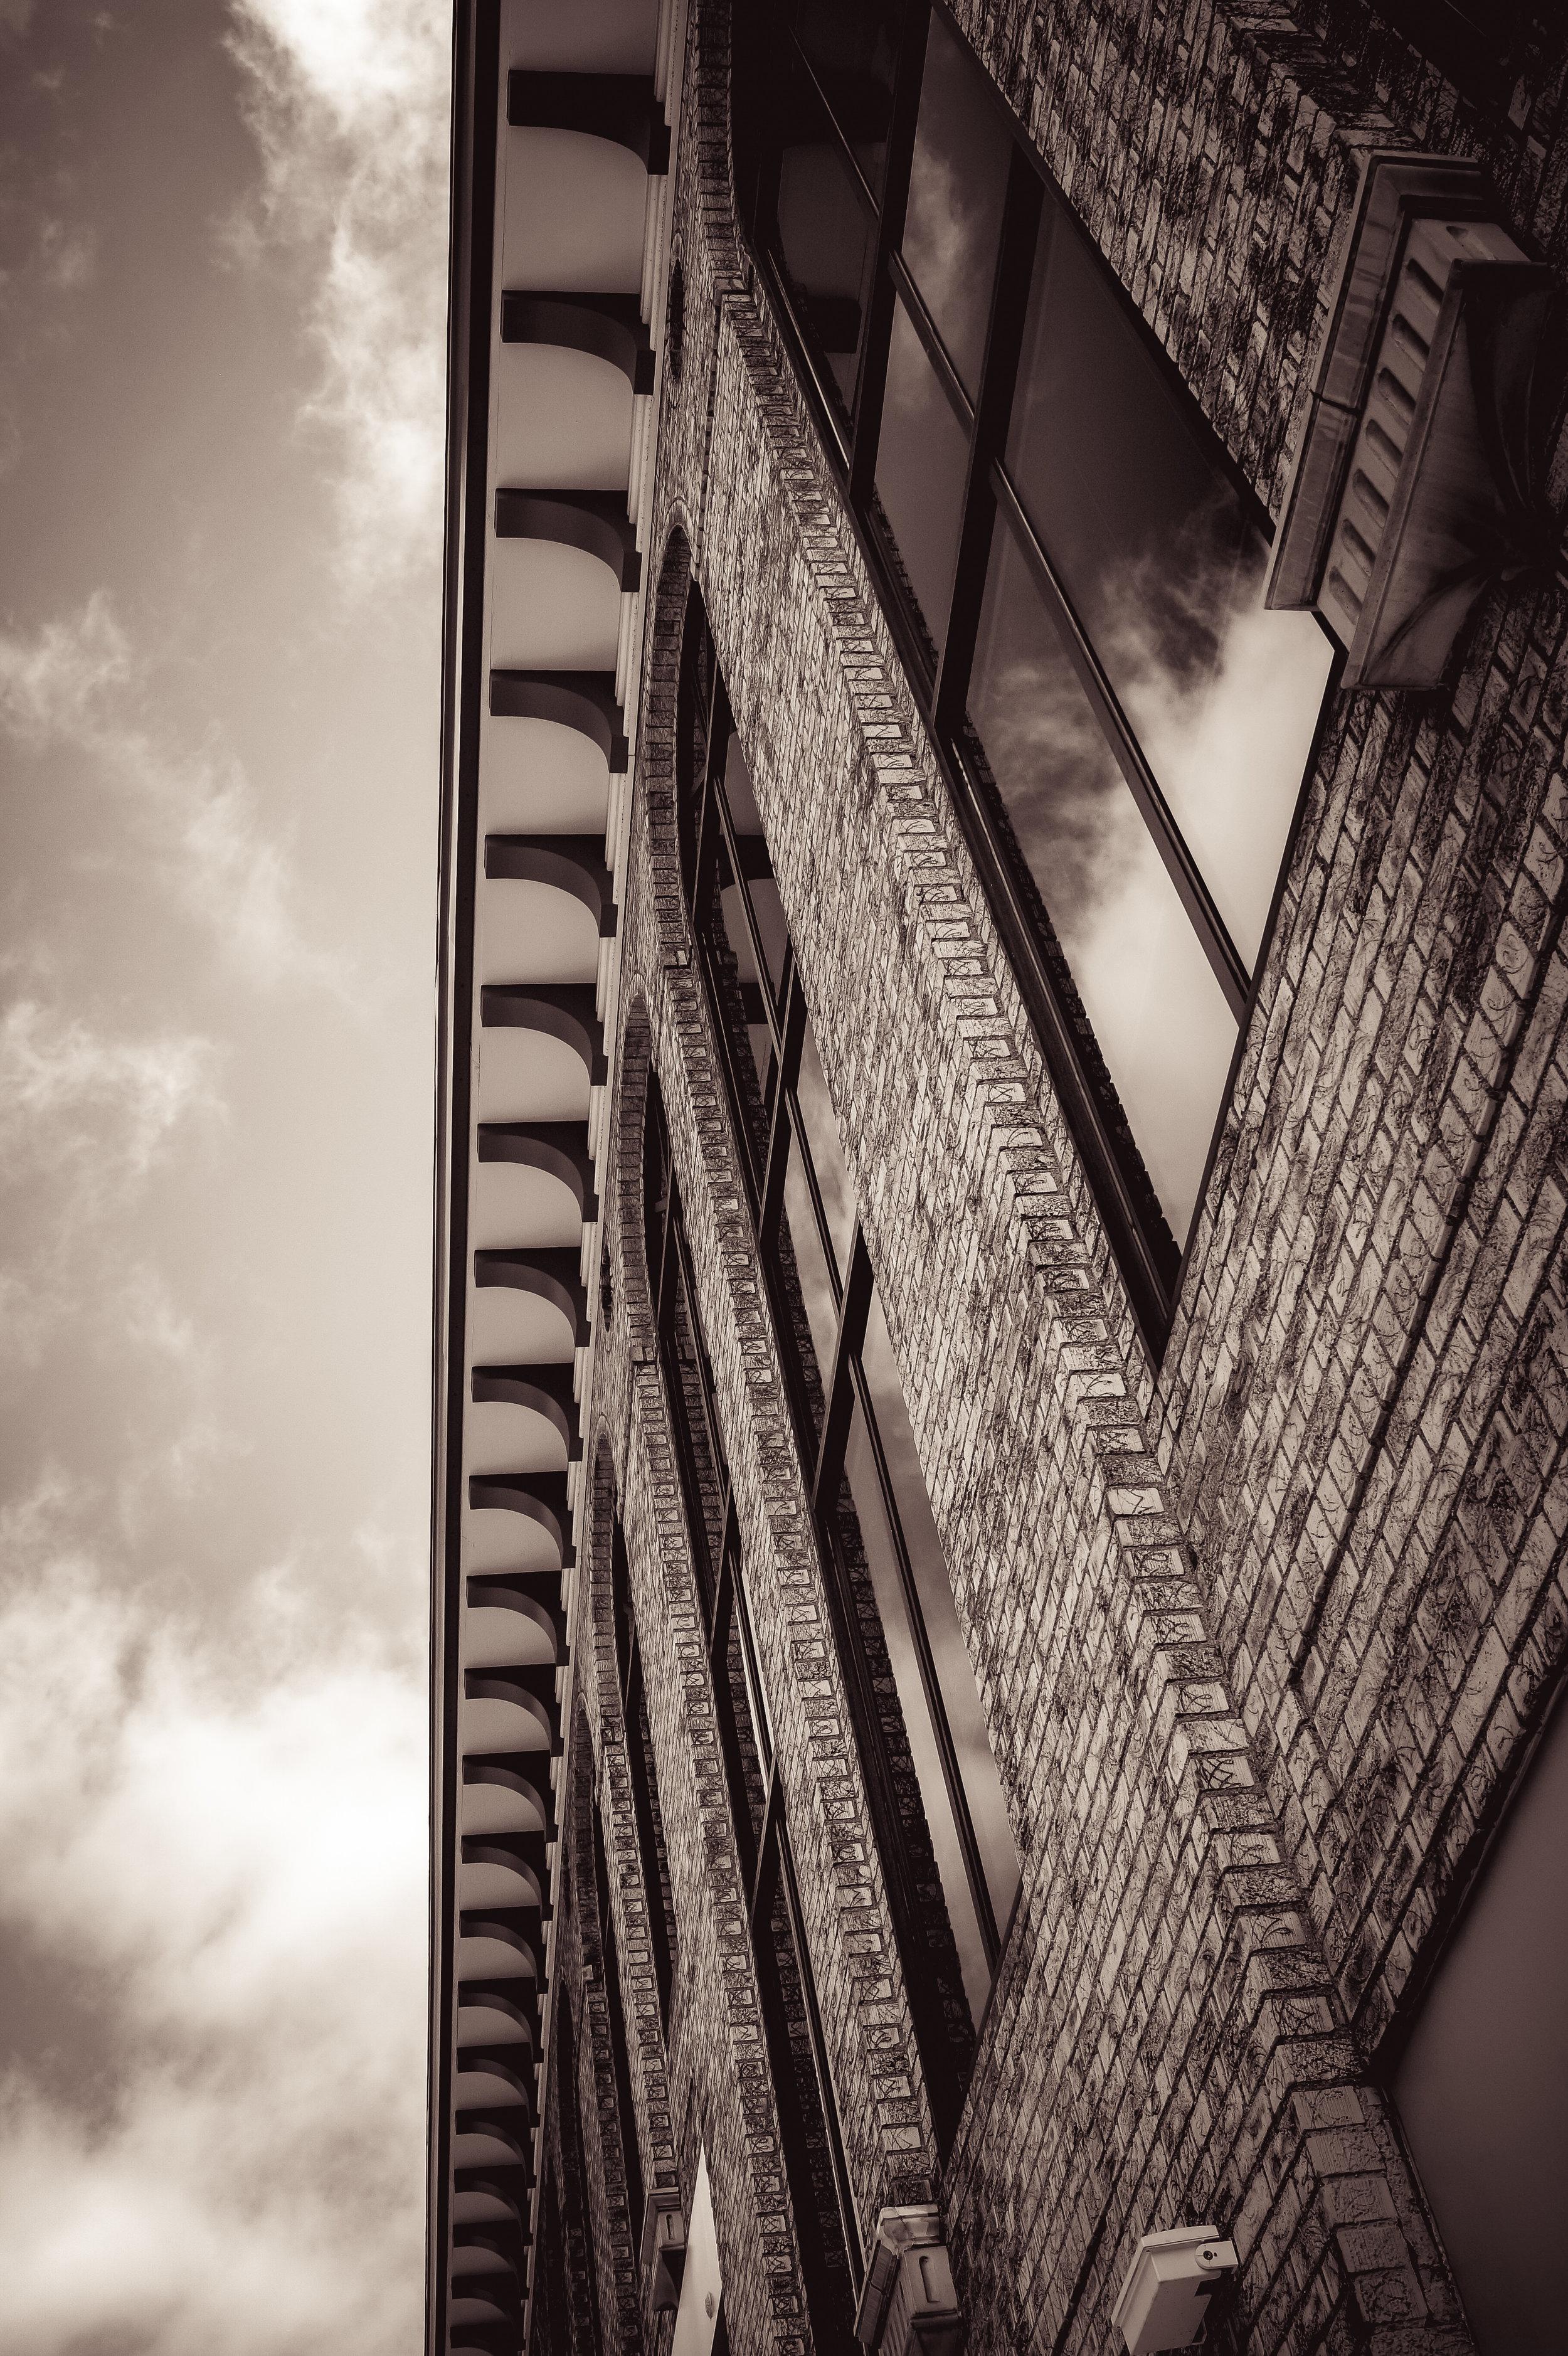 Architecture + Clouds